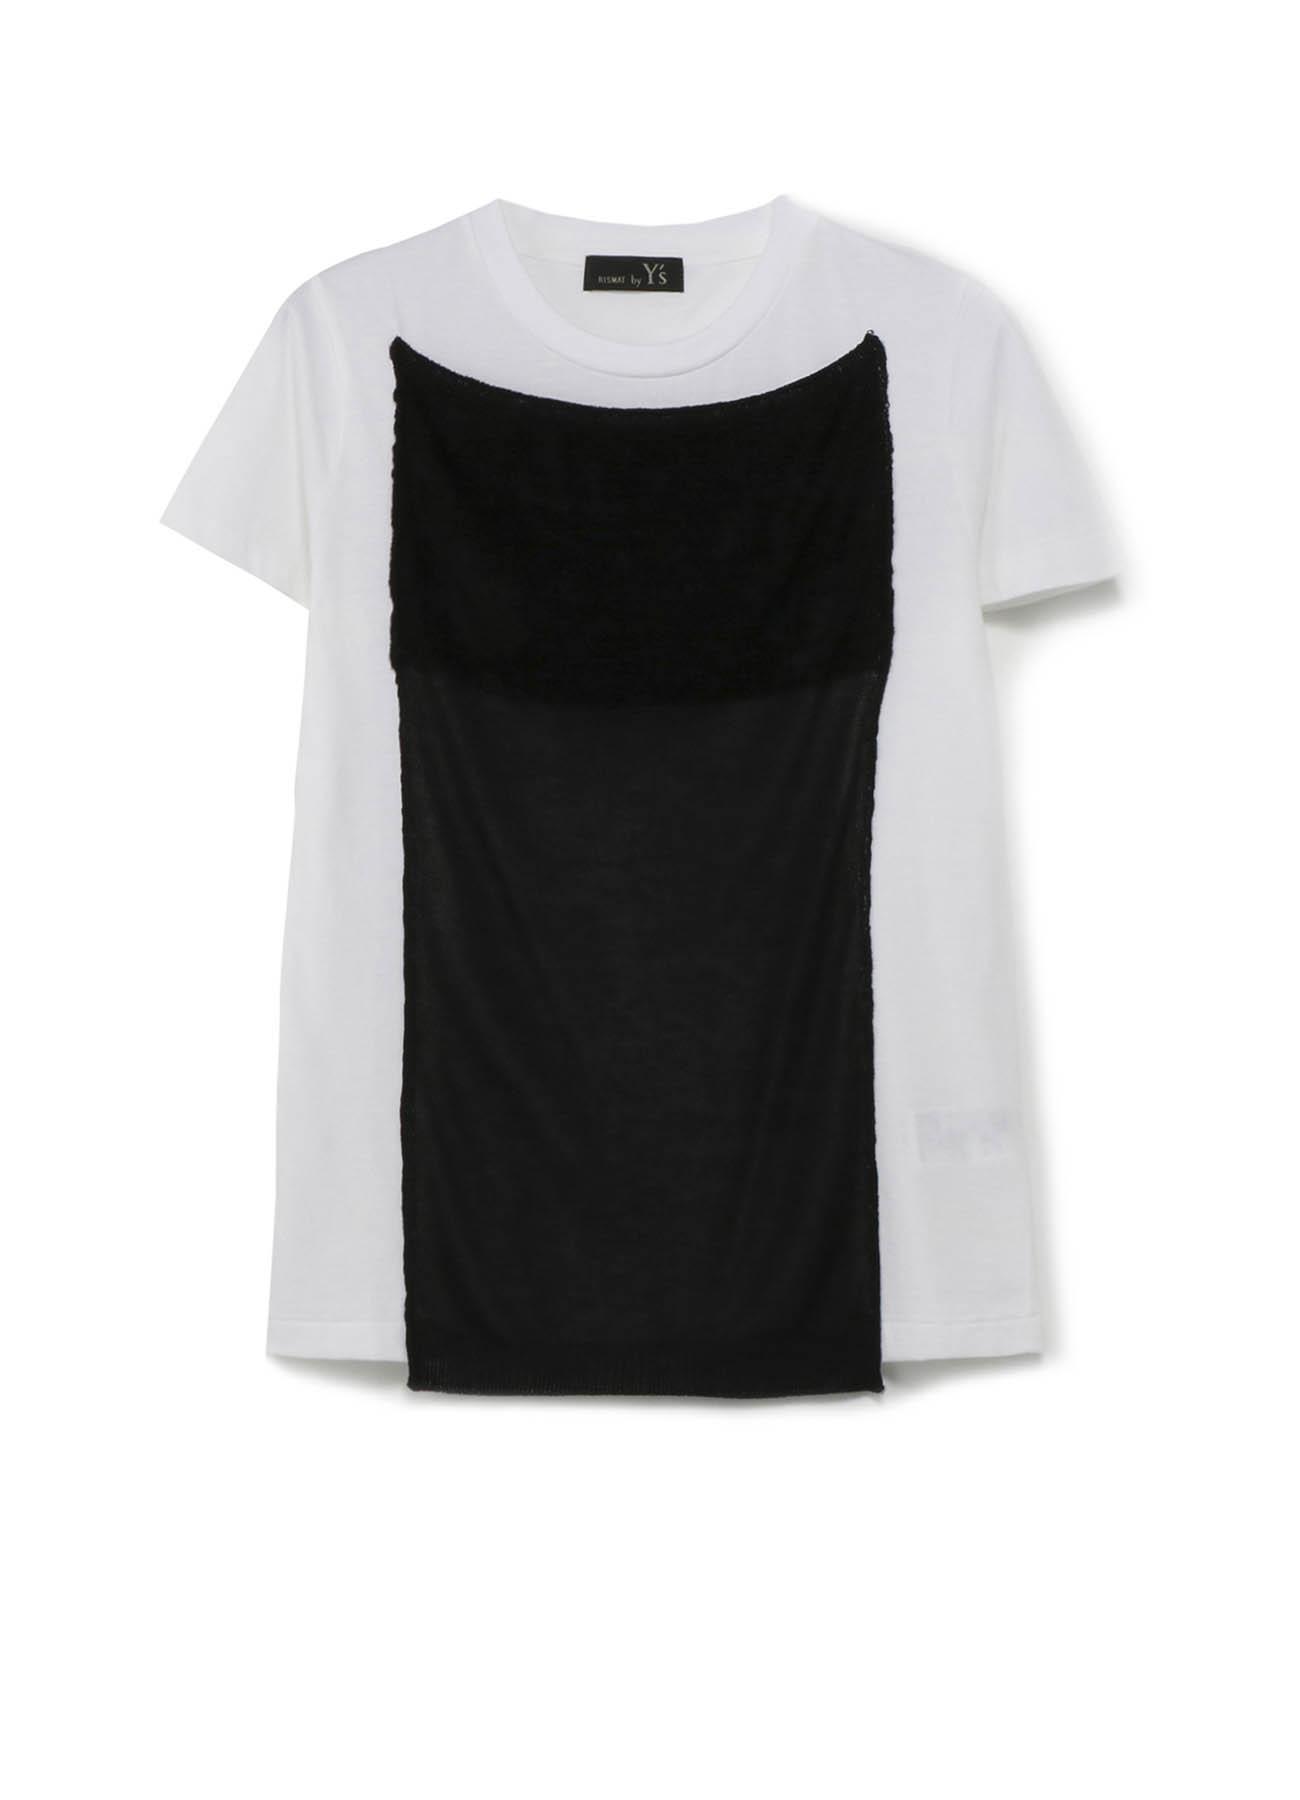 RISMATbyY's コットン天竺 モールニット付半袖Tシャツ